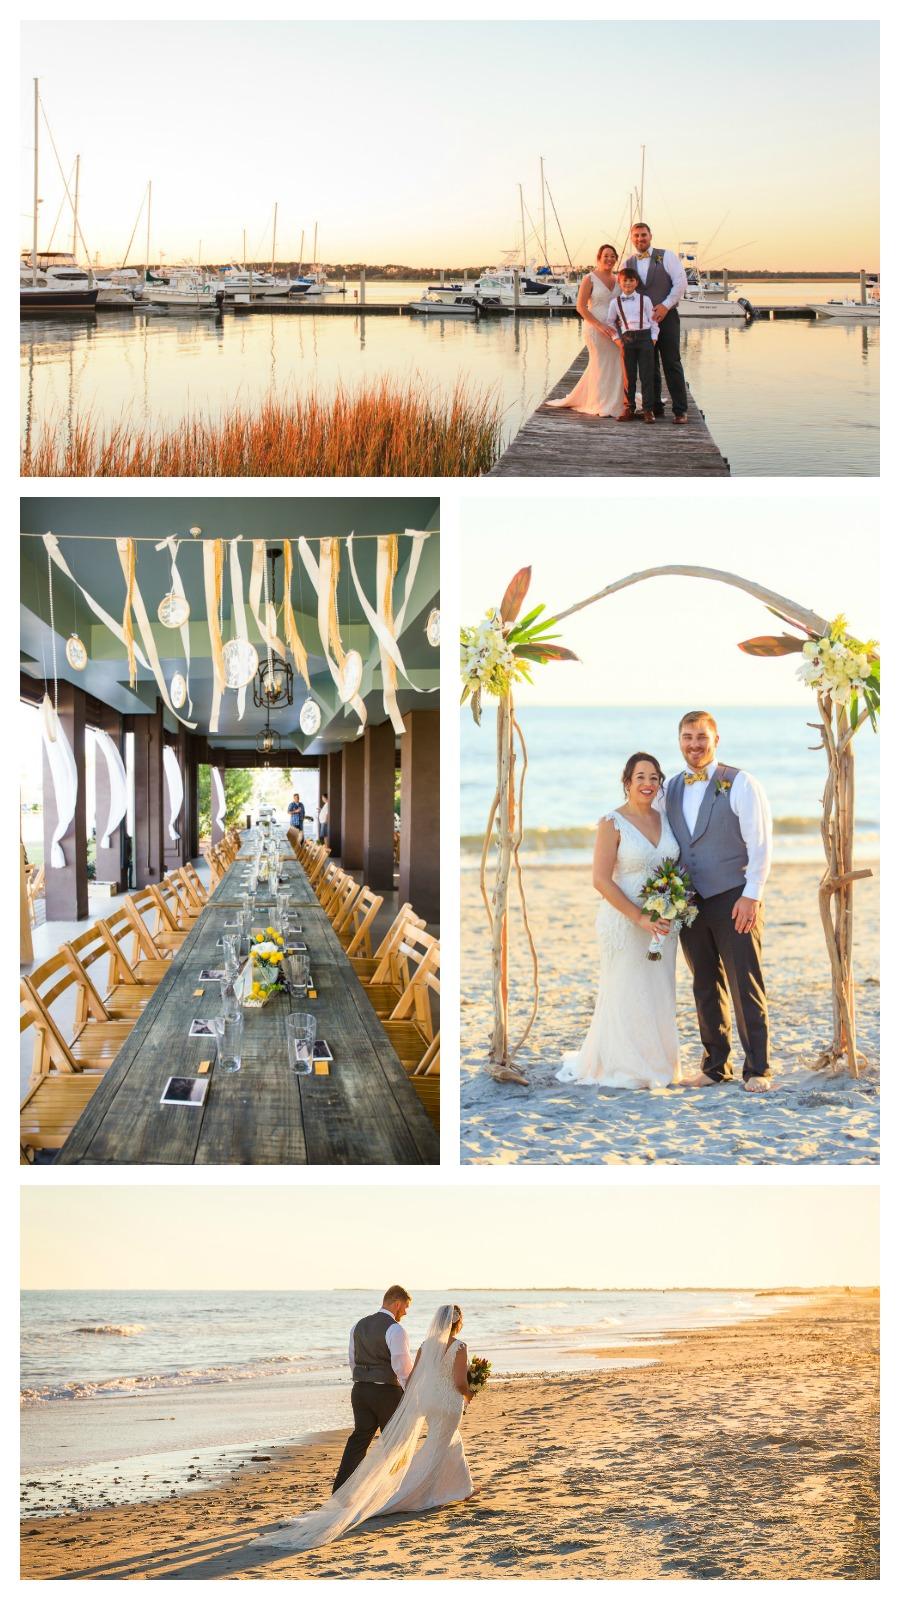 Jessi and NIck: Beachfront Regatta Inn Wedding on Folly Beach, South Carolina | Palmetto State Weddings | Diana Deaver Photography | South Carolina beach wedding | Southern beach wedding | Folly Beach wedding